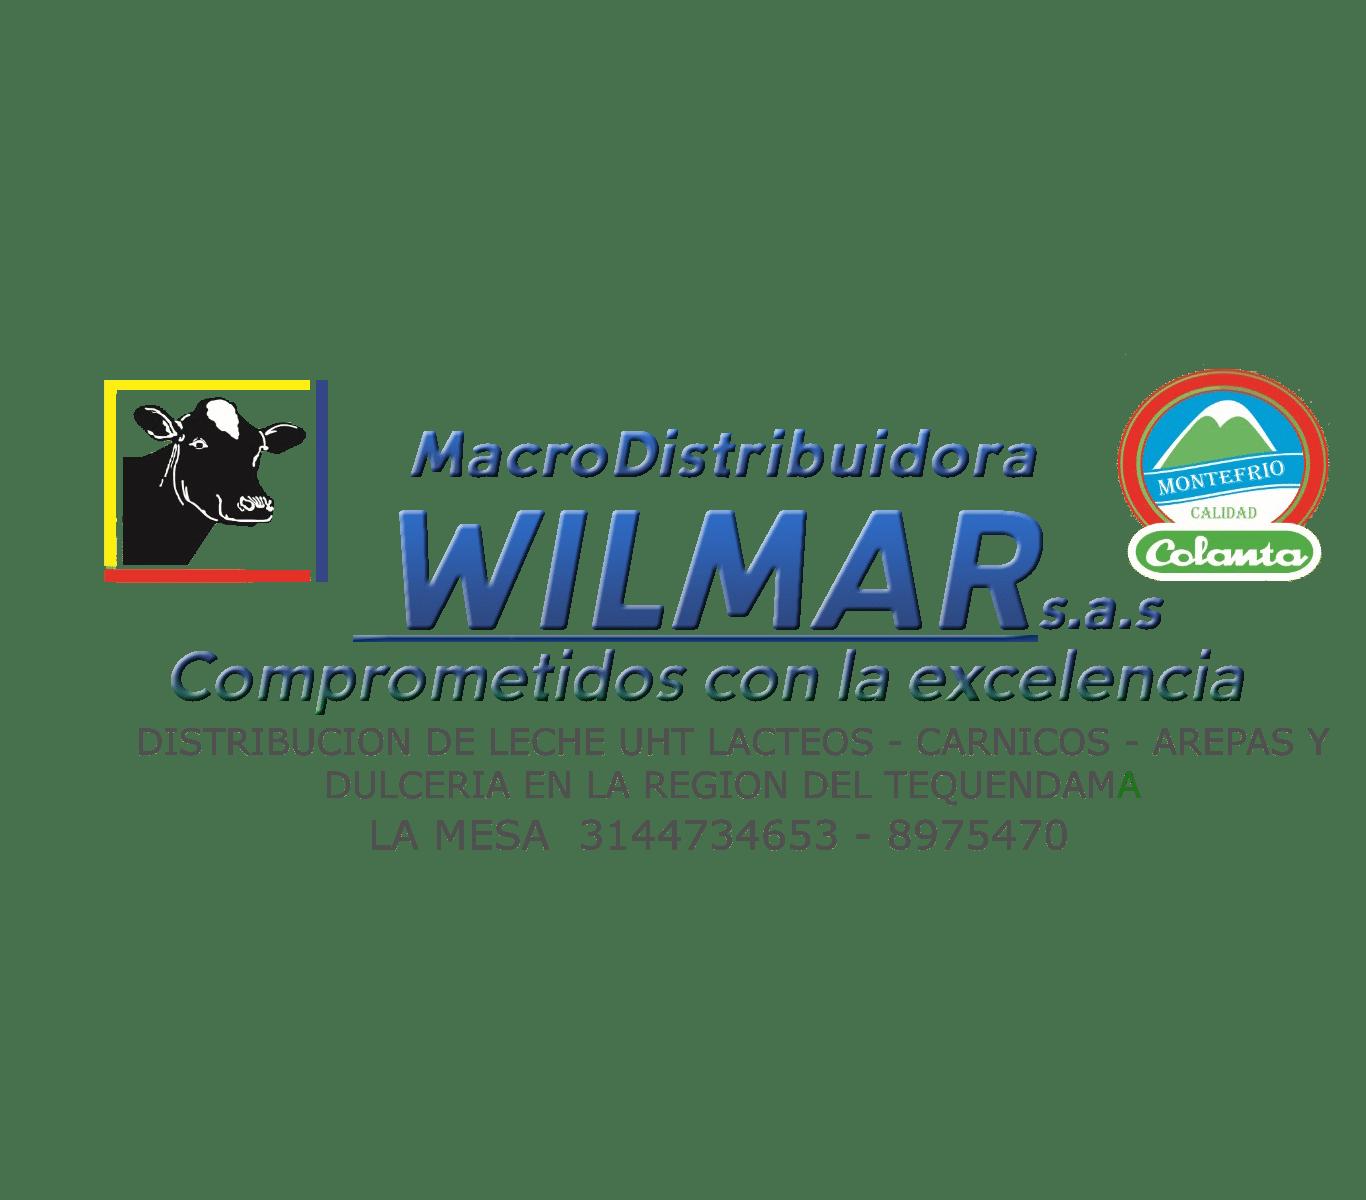 Macro Distribuidora Wilmar